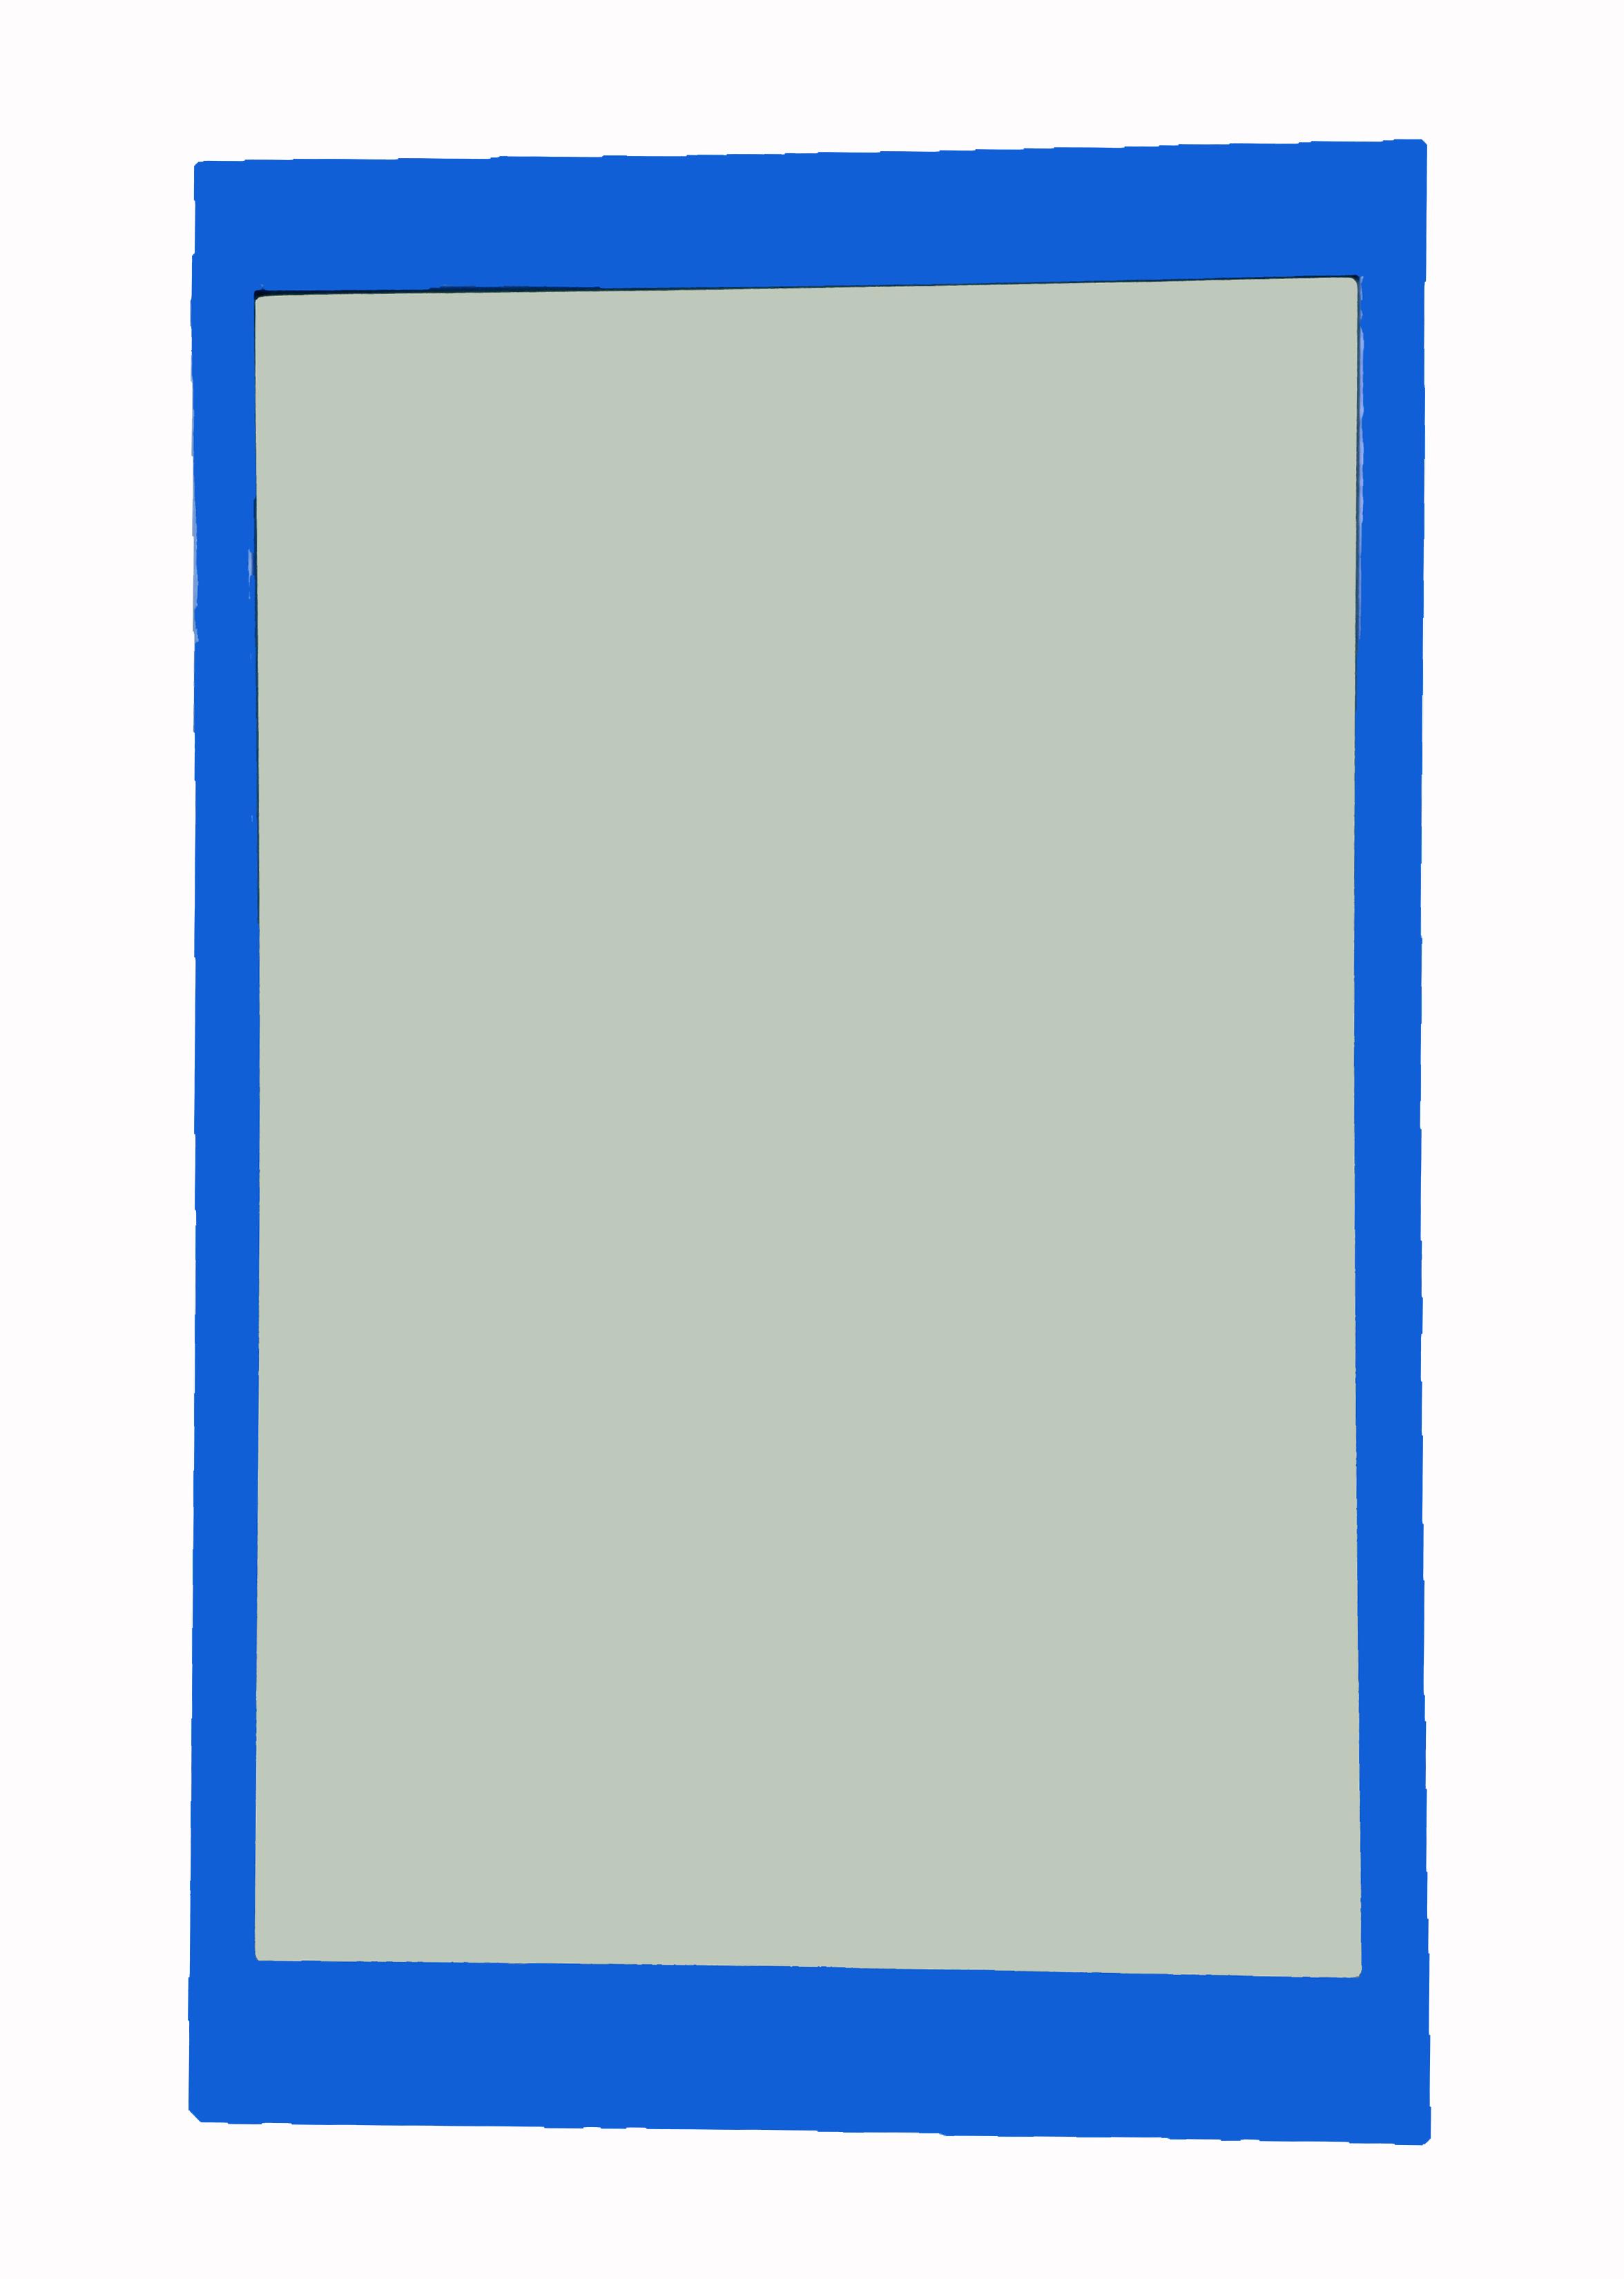 ppt 背景 背景图片 边框 模板 设计 矢量 矢量图 素材 相框 2352_3301